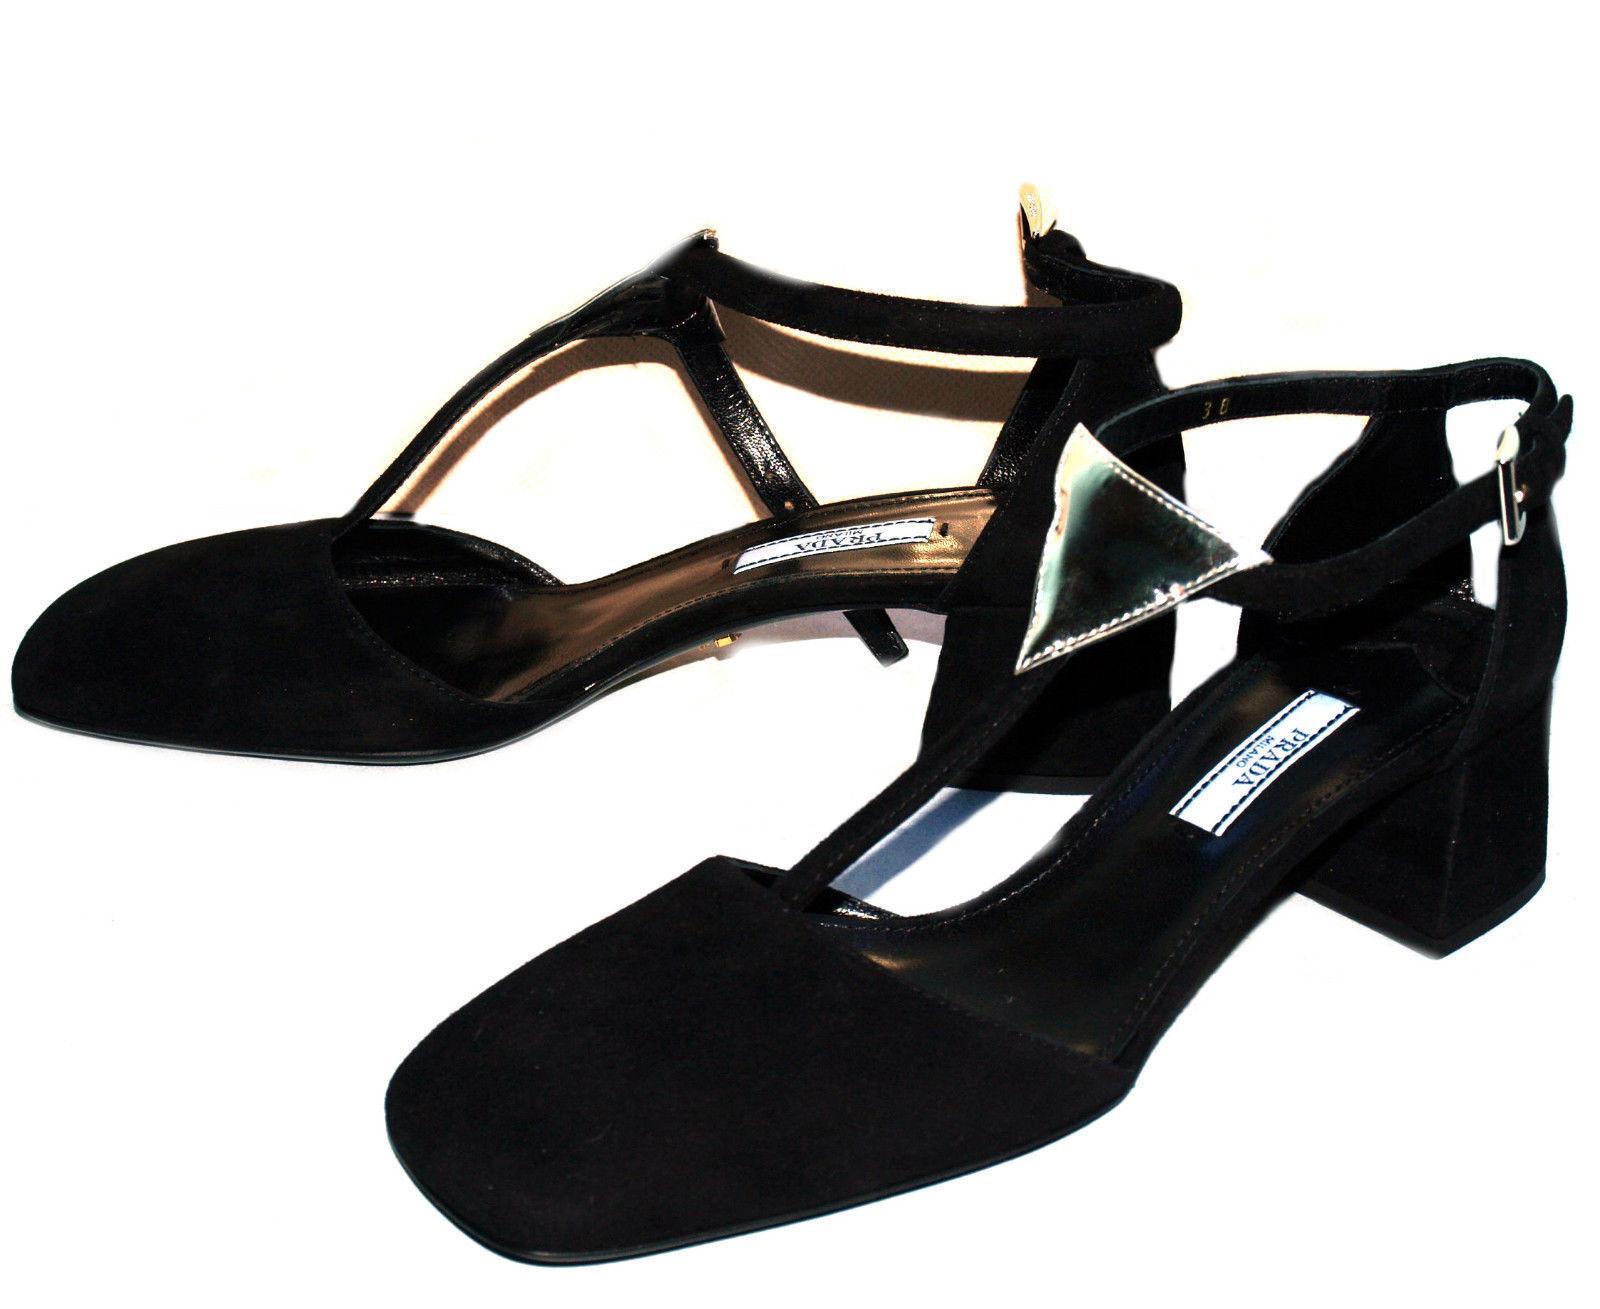 Prada Decollete Decollete Prada scarpa nera pelle scamosciata 38 EU a8badc